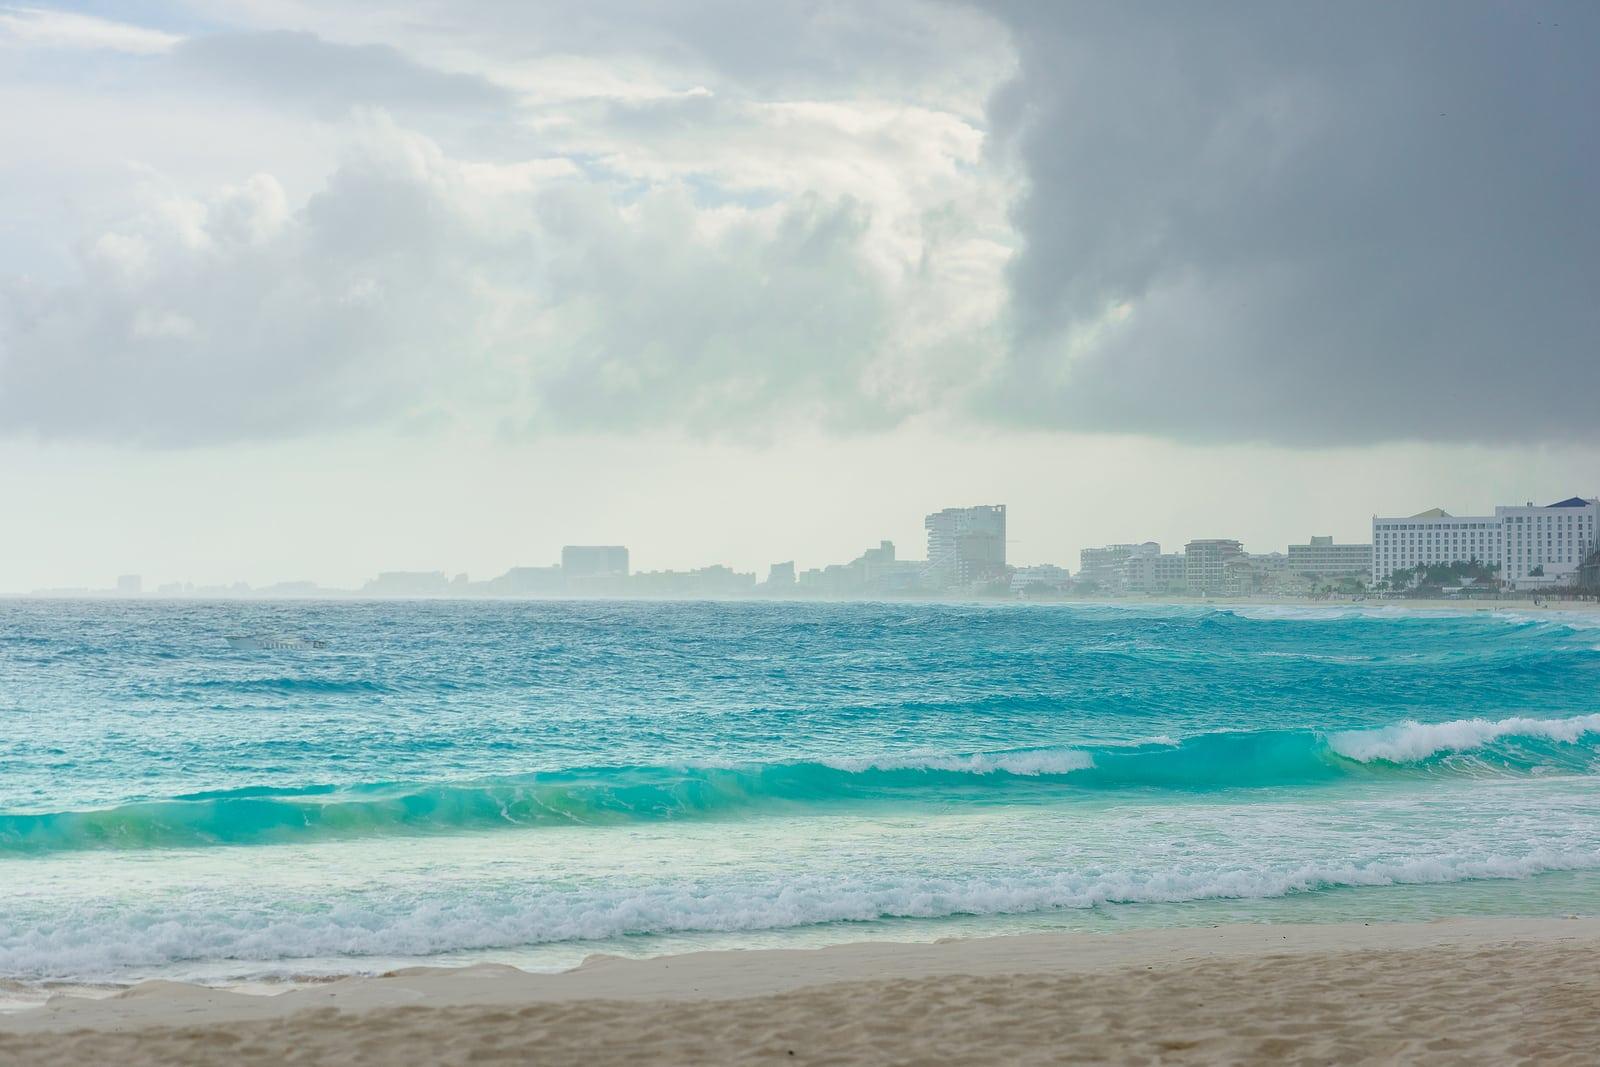 Sea shore on the Caribbean beach